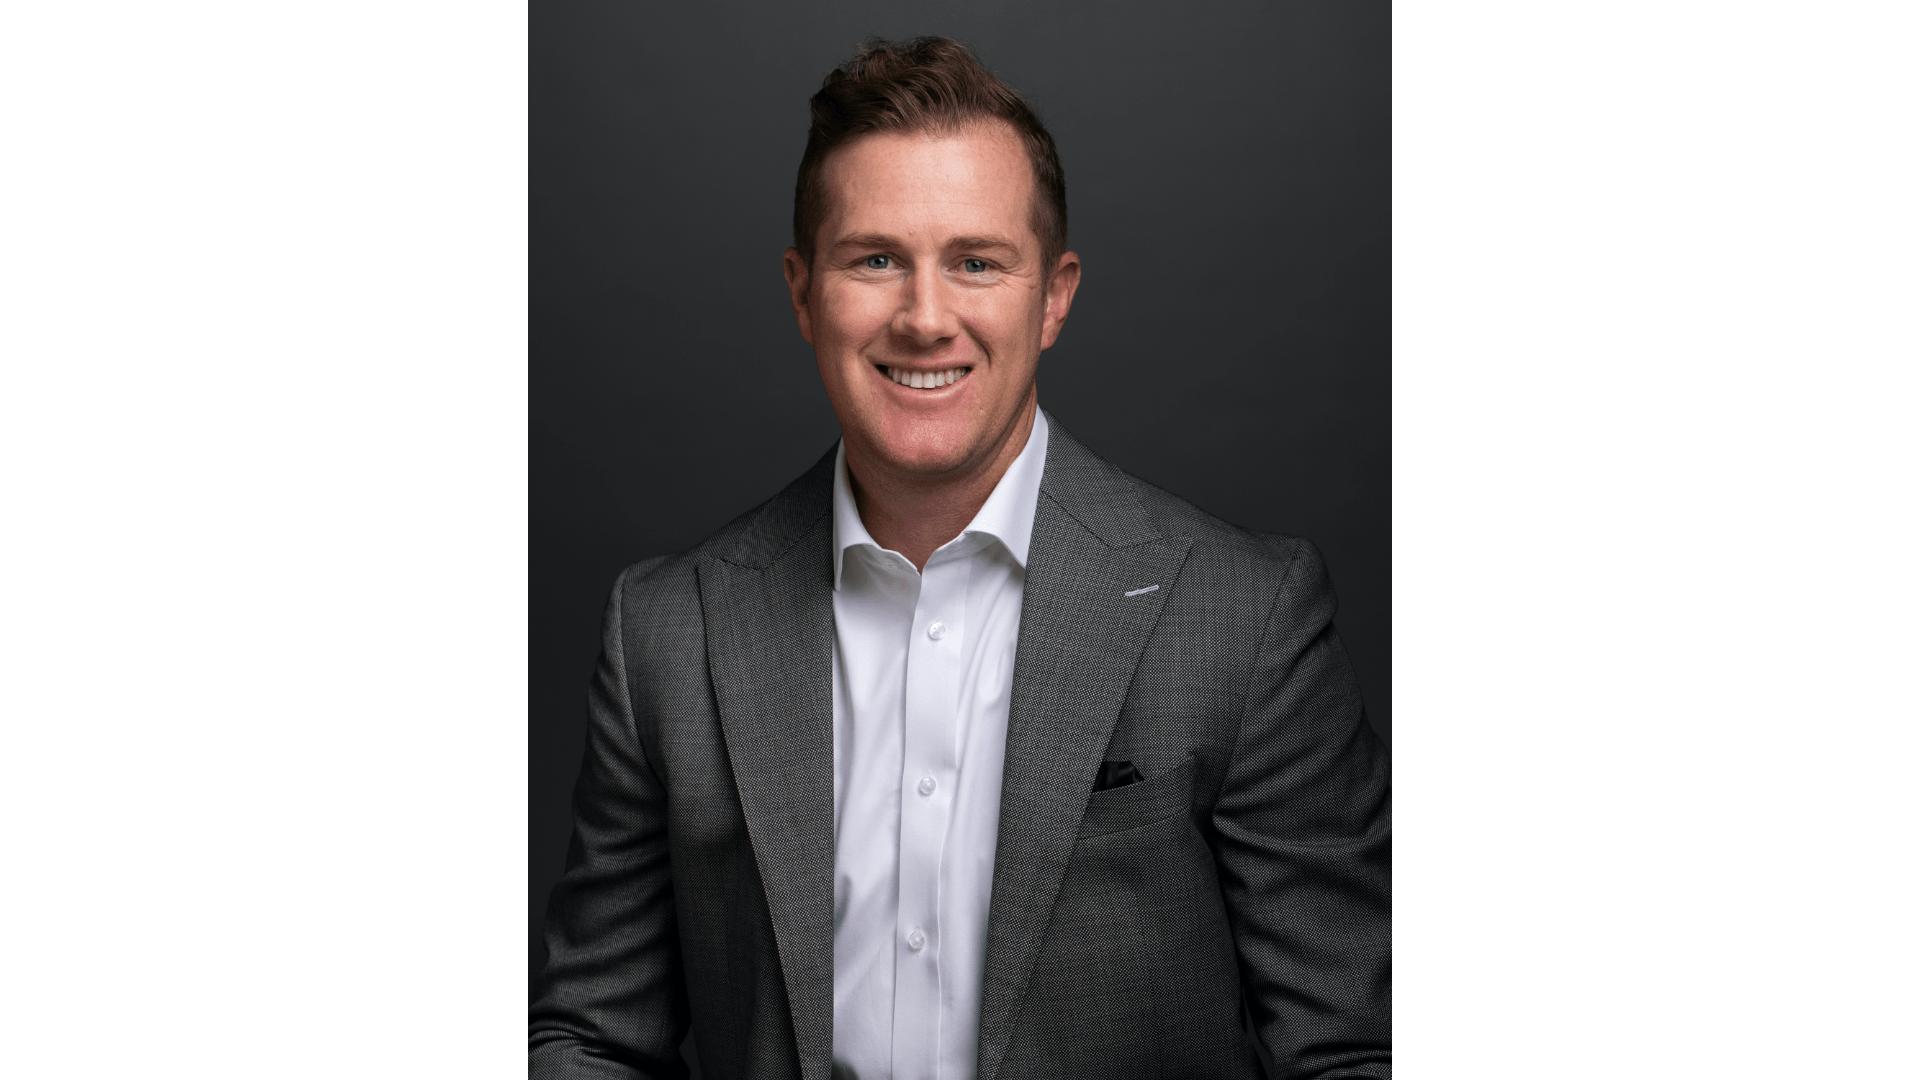 Co-Founder & CEO of Aptive Environmental, Vess Pearson